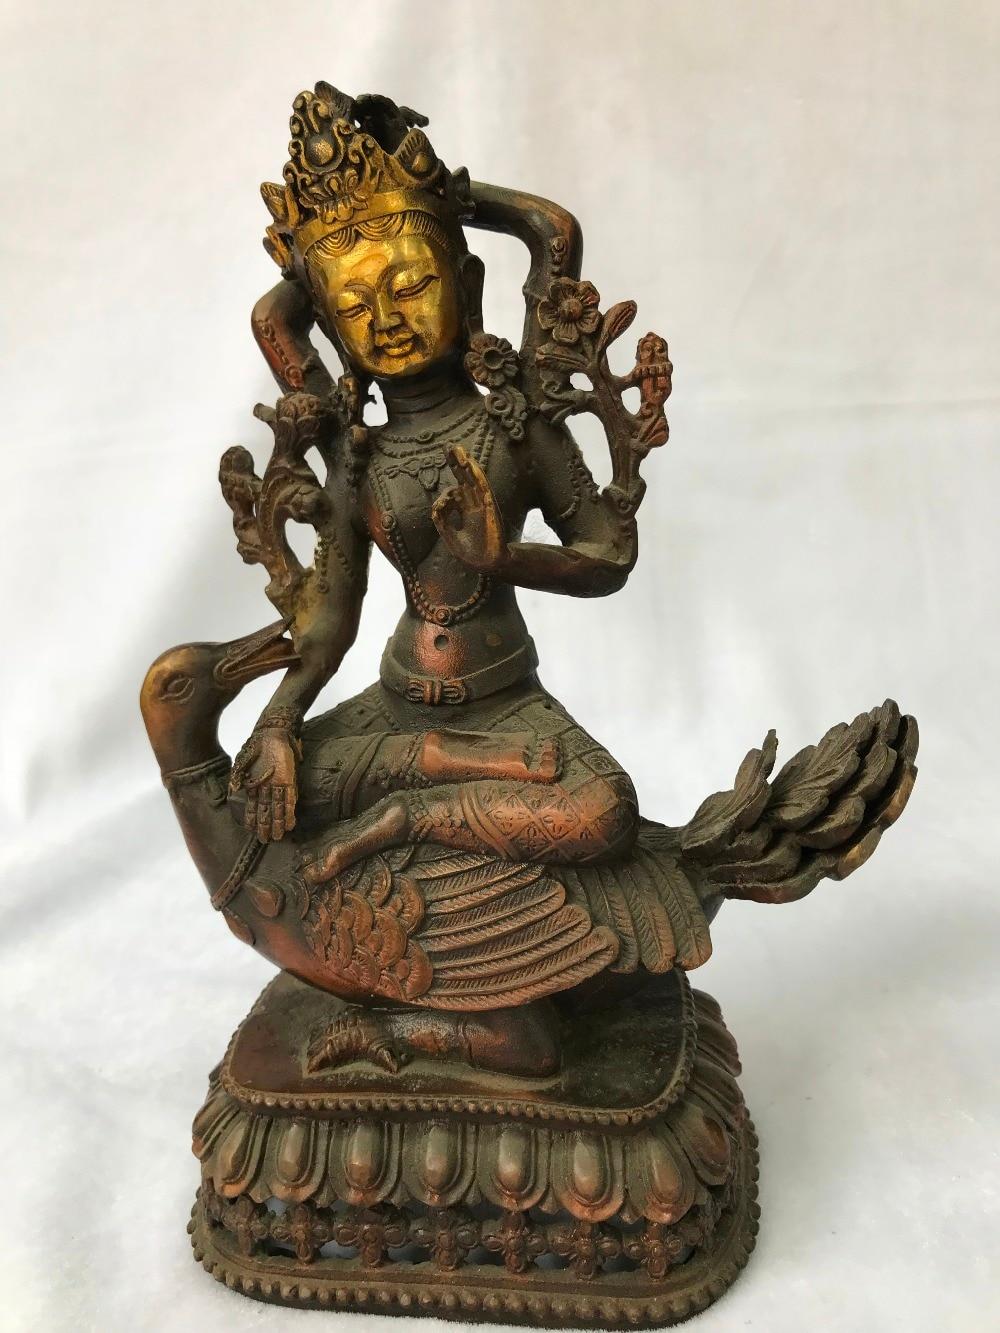 Estatua de bronce Tíbet chino Guan Yin kwan-yin Bodhisattva Diosa en estatua de pato Buda decoraciones para el hogar